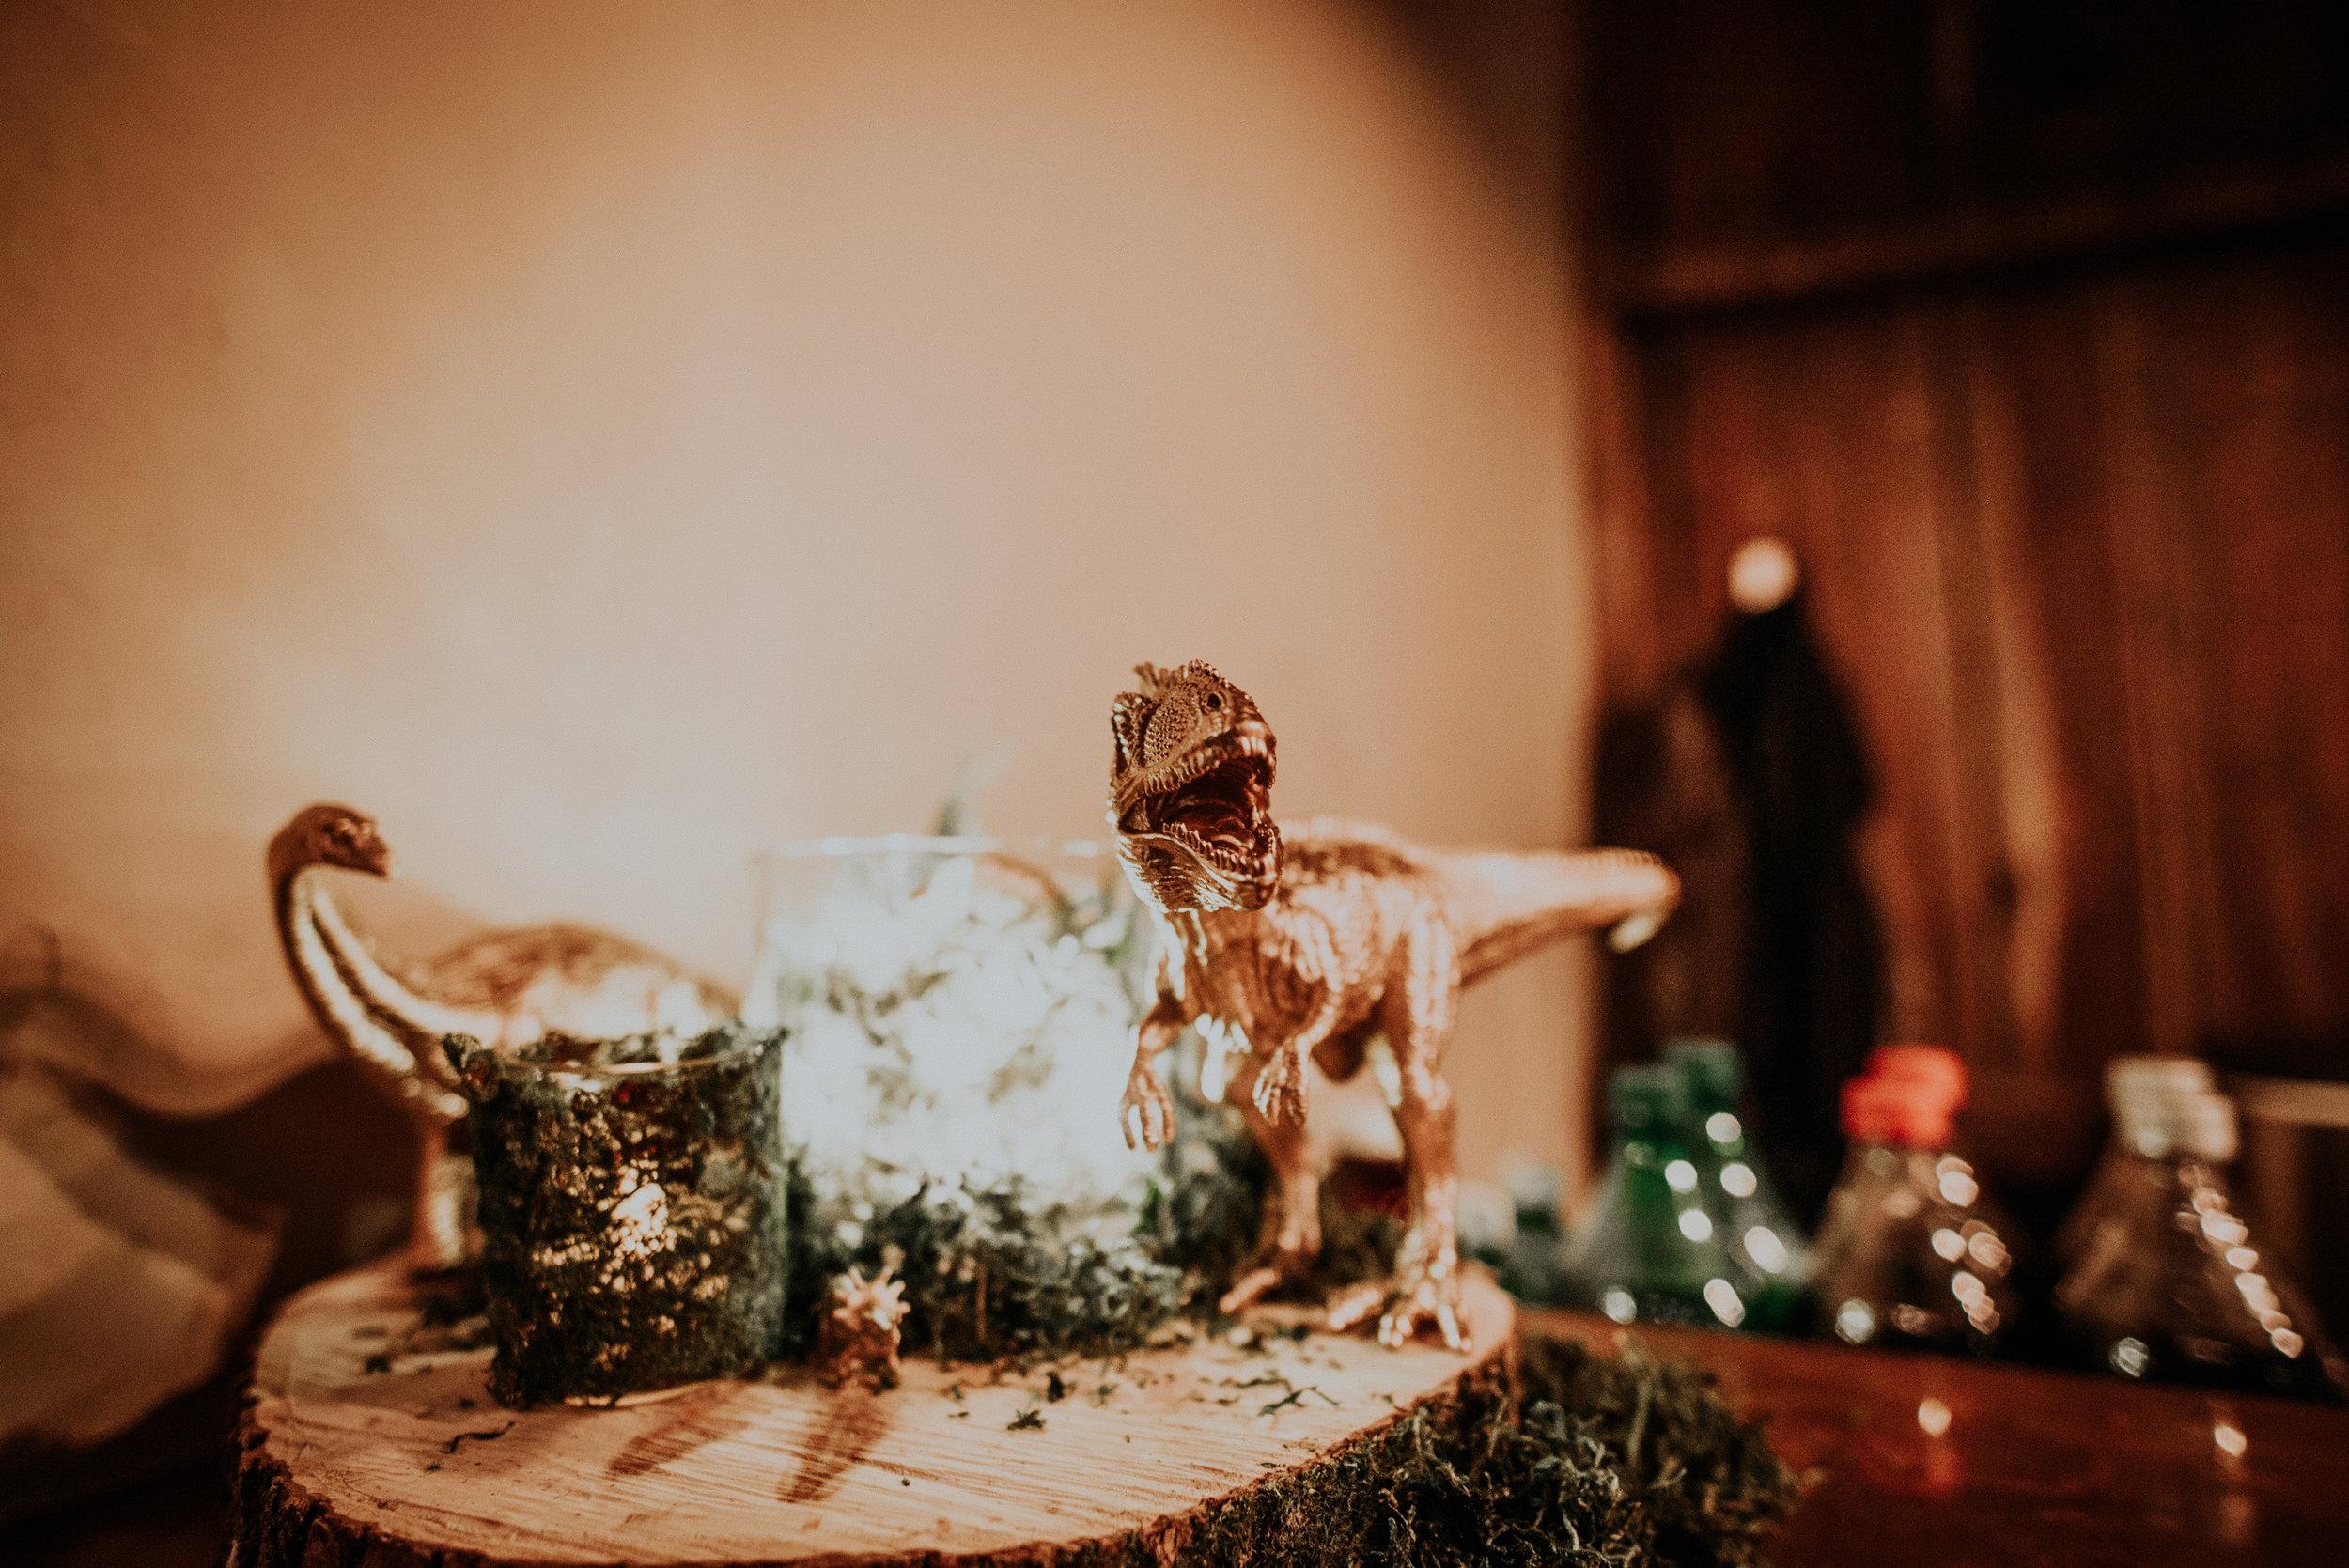 BridesbyYoung-RealWedding-PlusSizeBridal-BillyCourtney-JurassicParkTheme-19.jpg